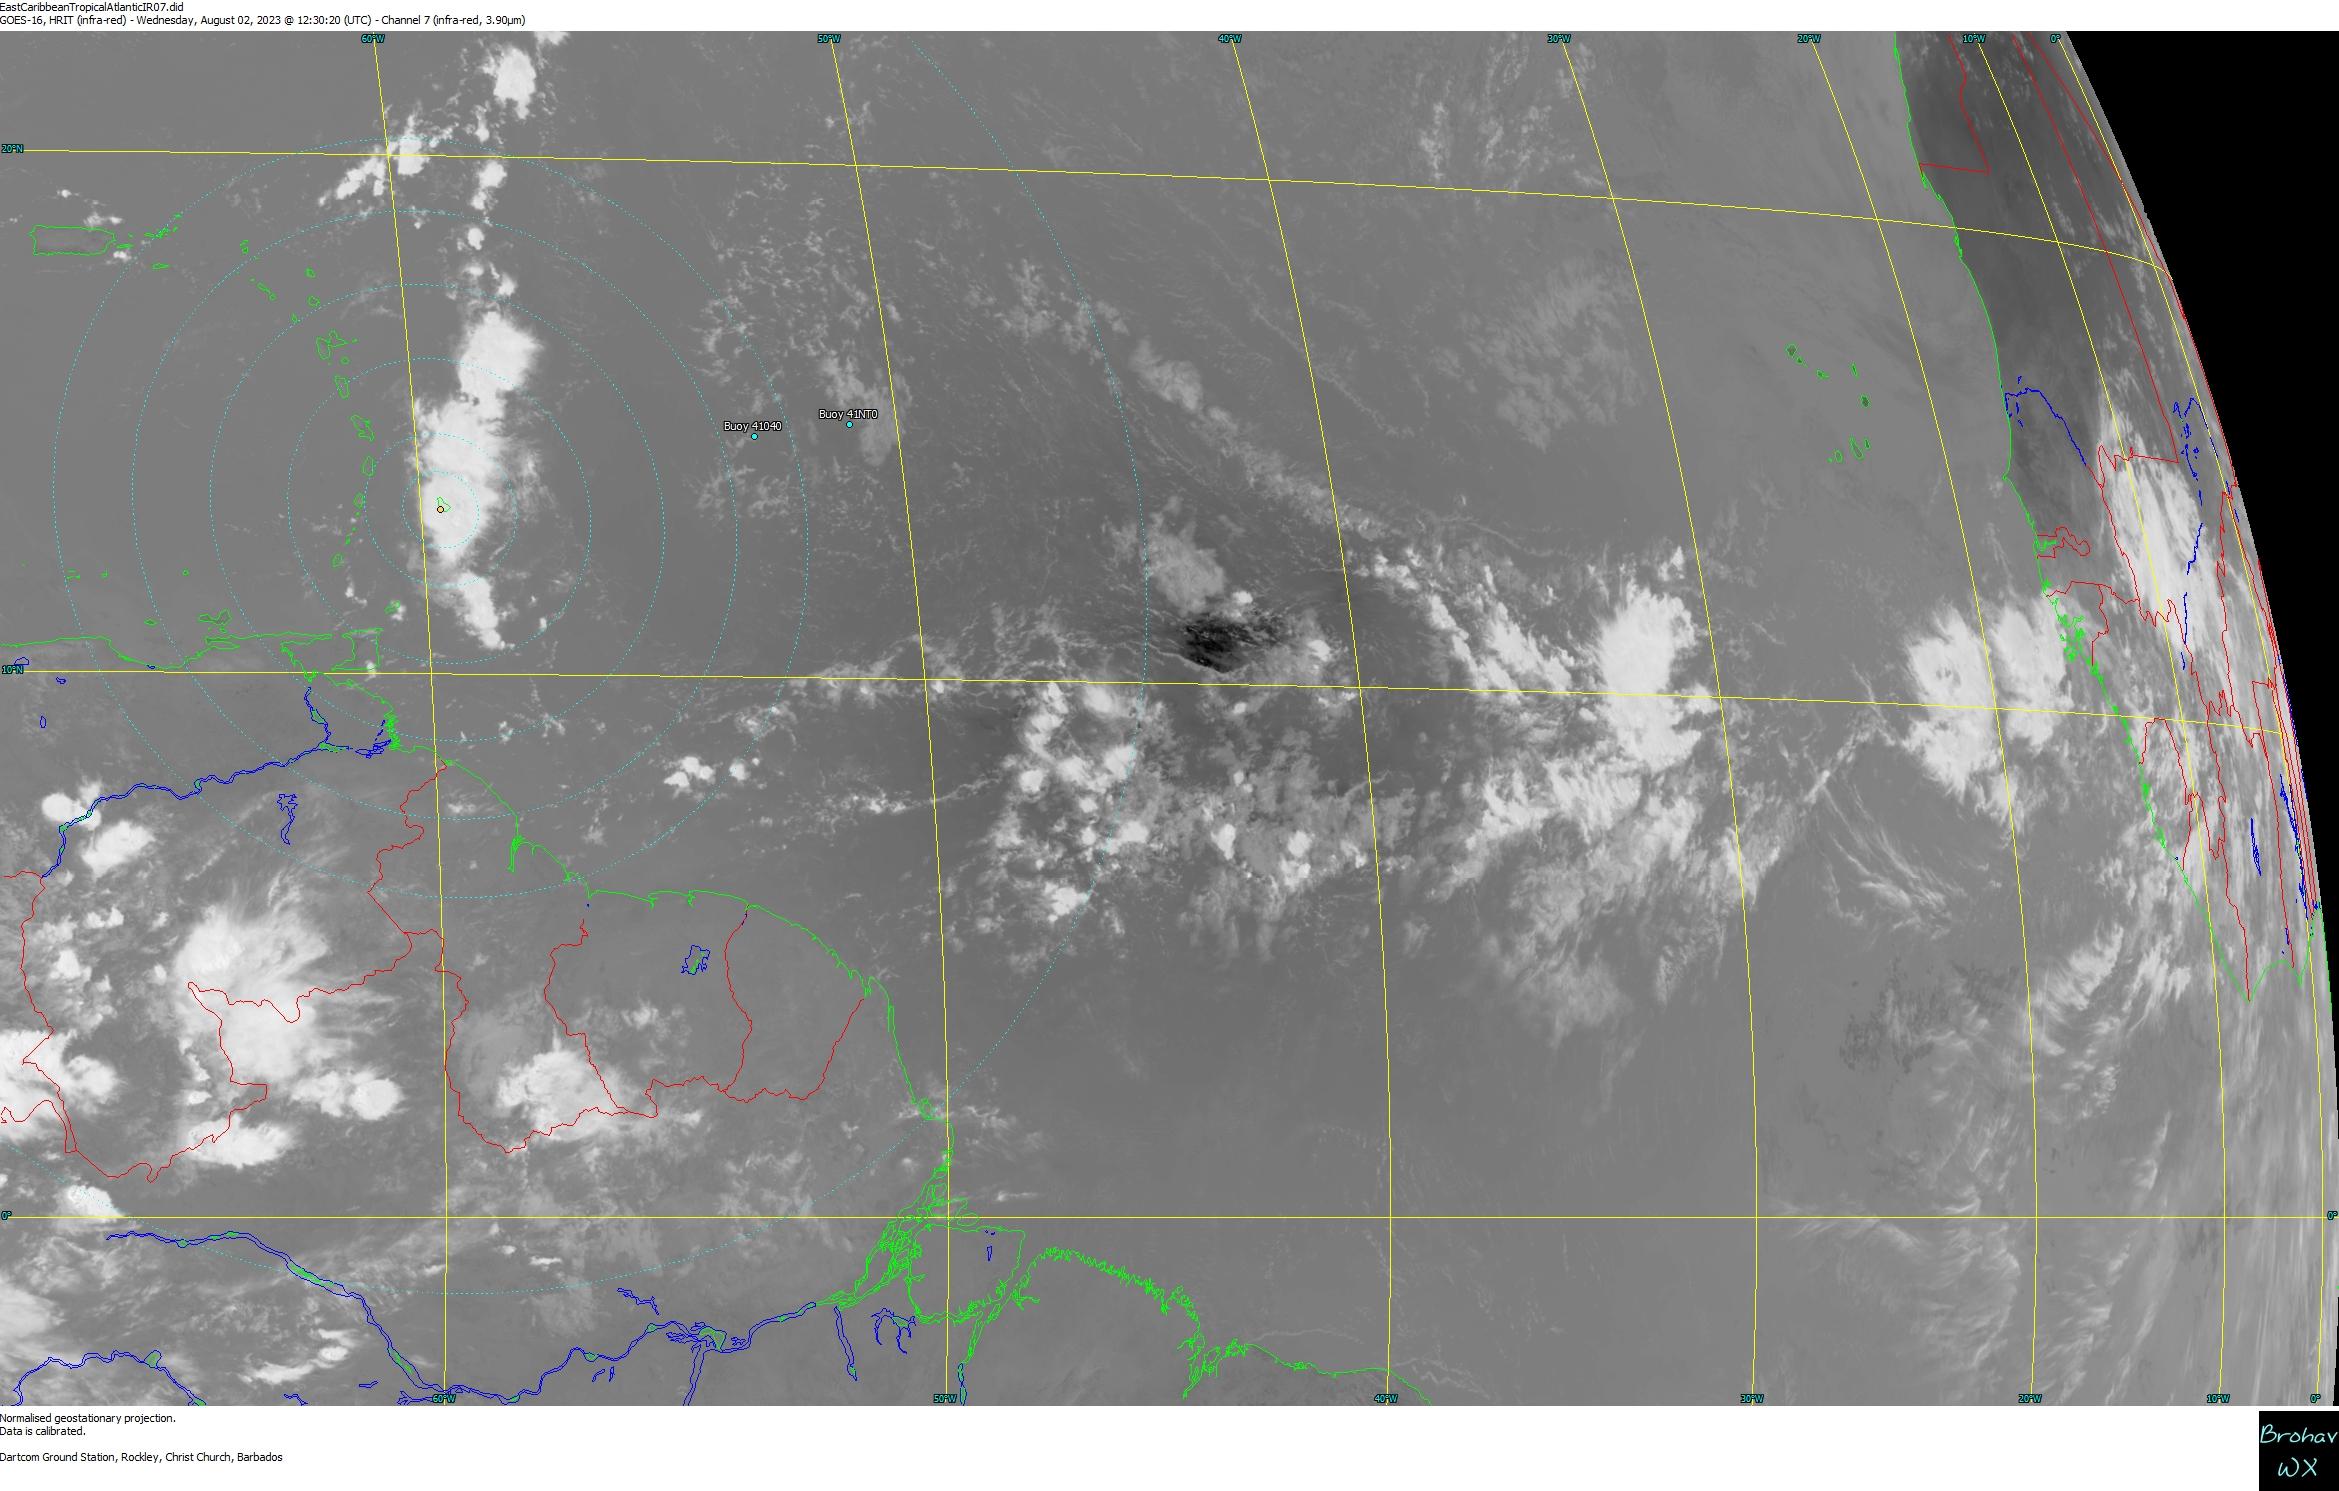 Caribbean Weather Map Forecast.Barbados Caribbean Weather Satellite Image Lightning Radar